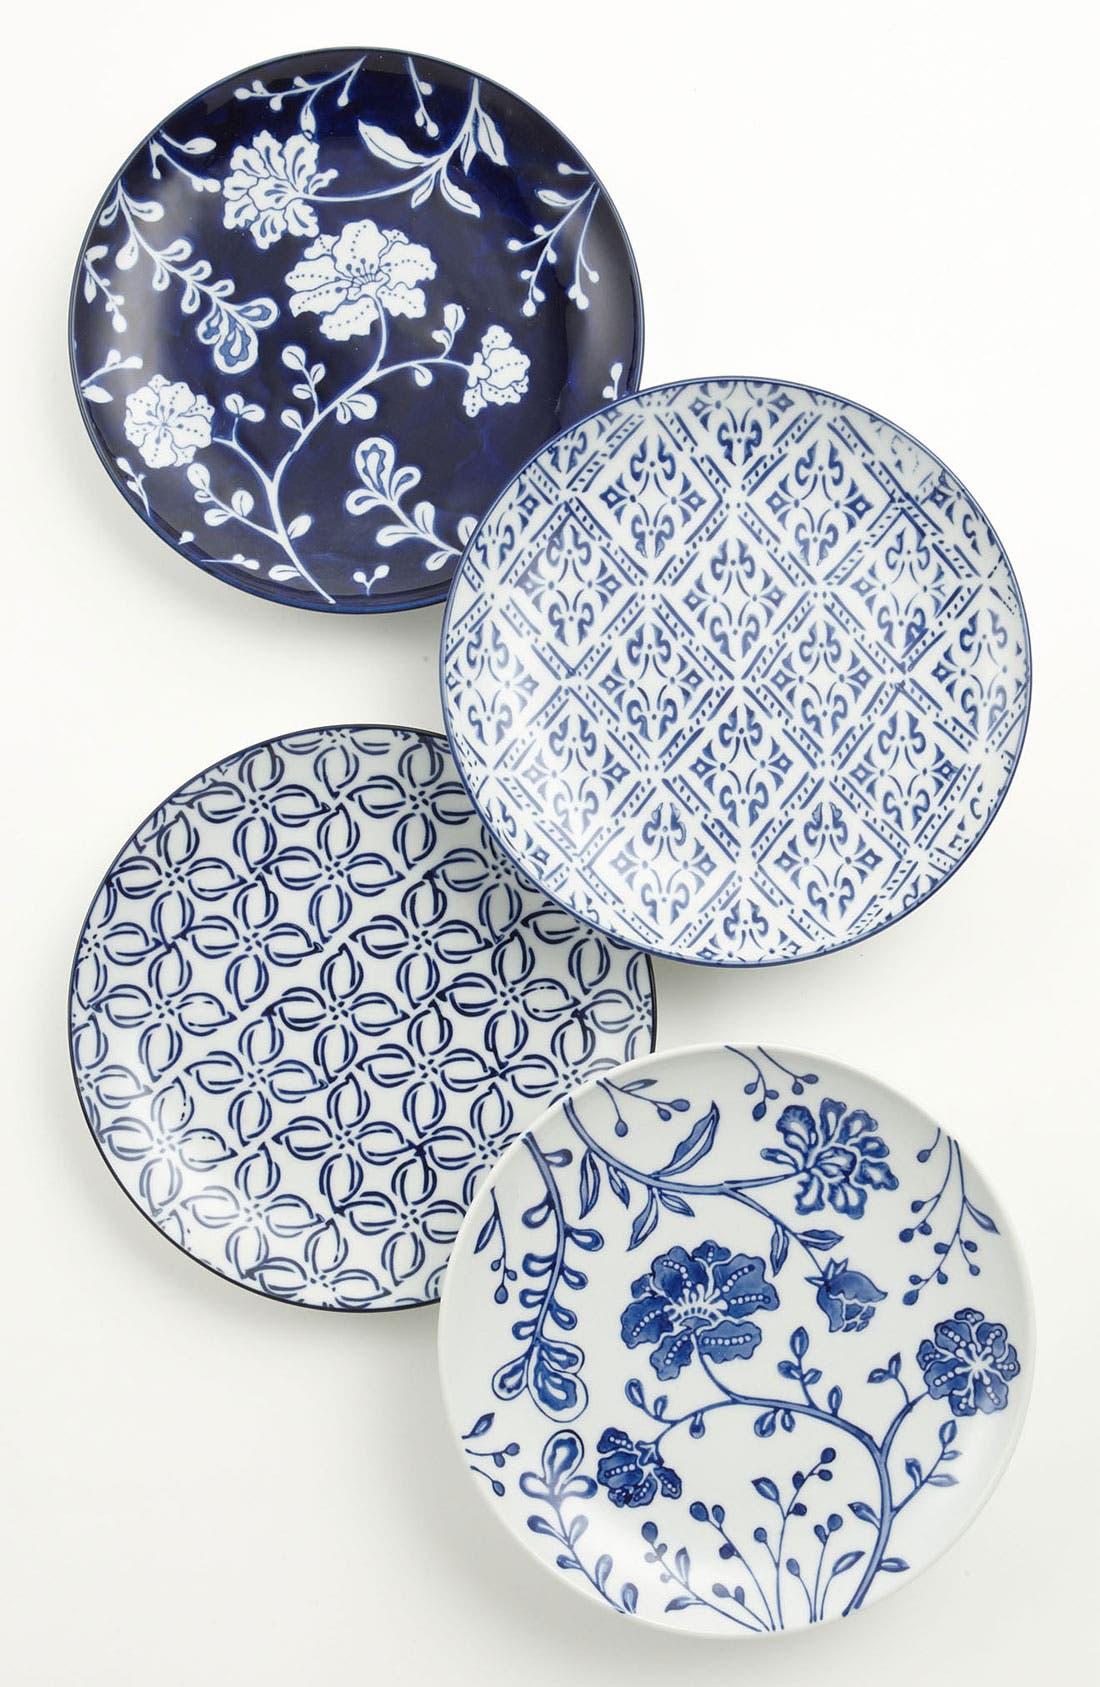 Main Image - Mixed Pattern Dessert Plates (Set of 4)